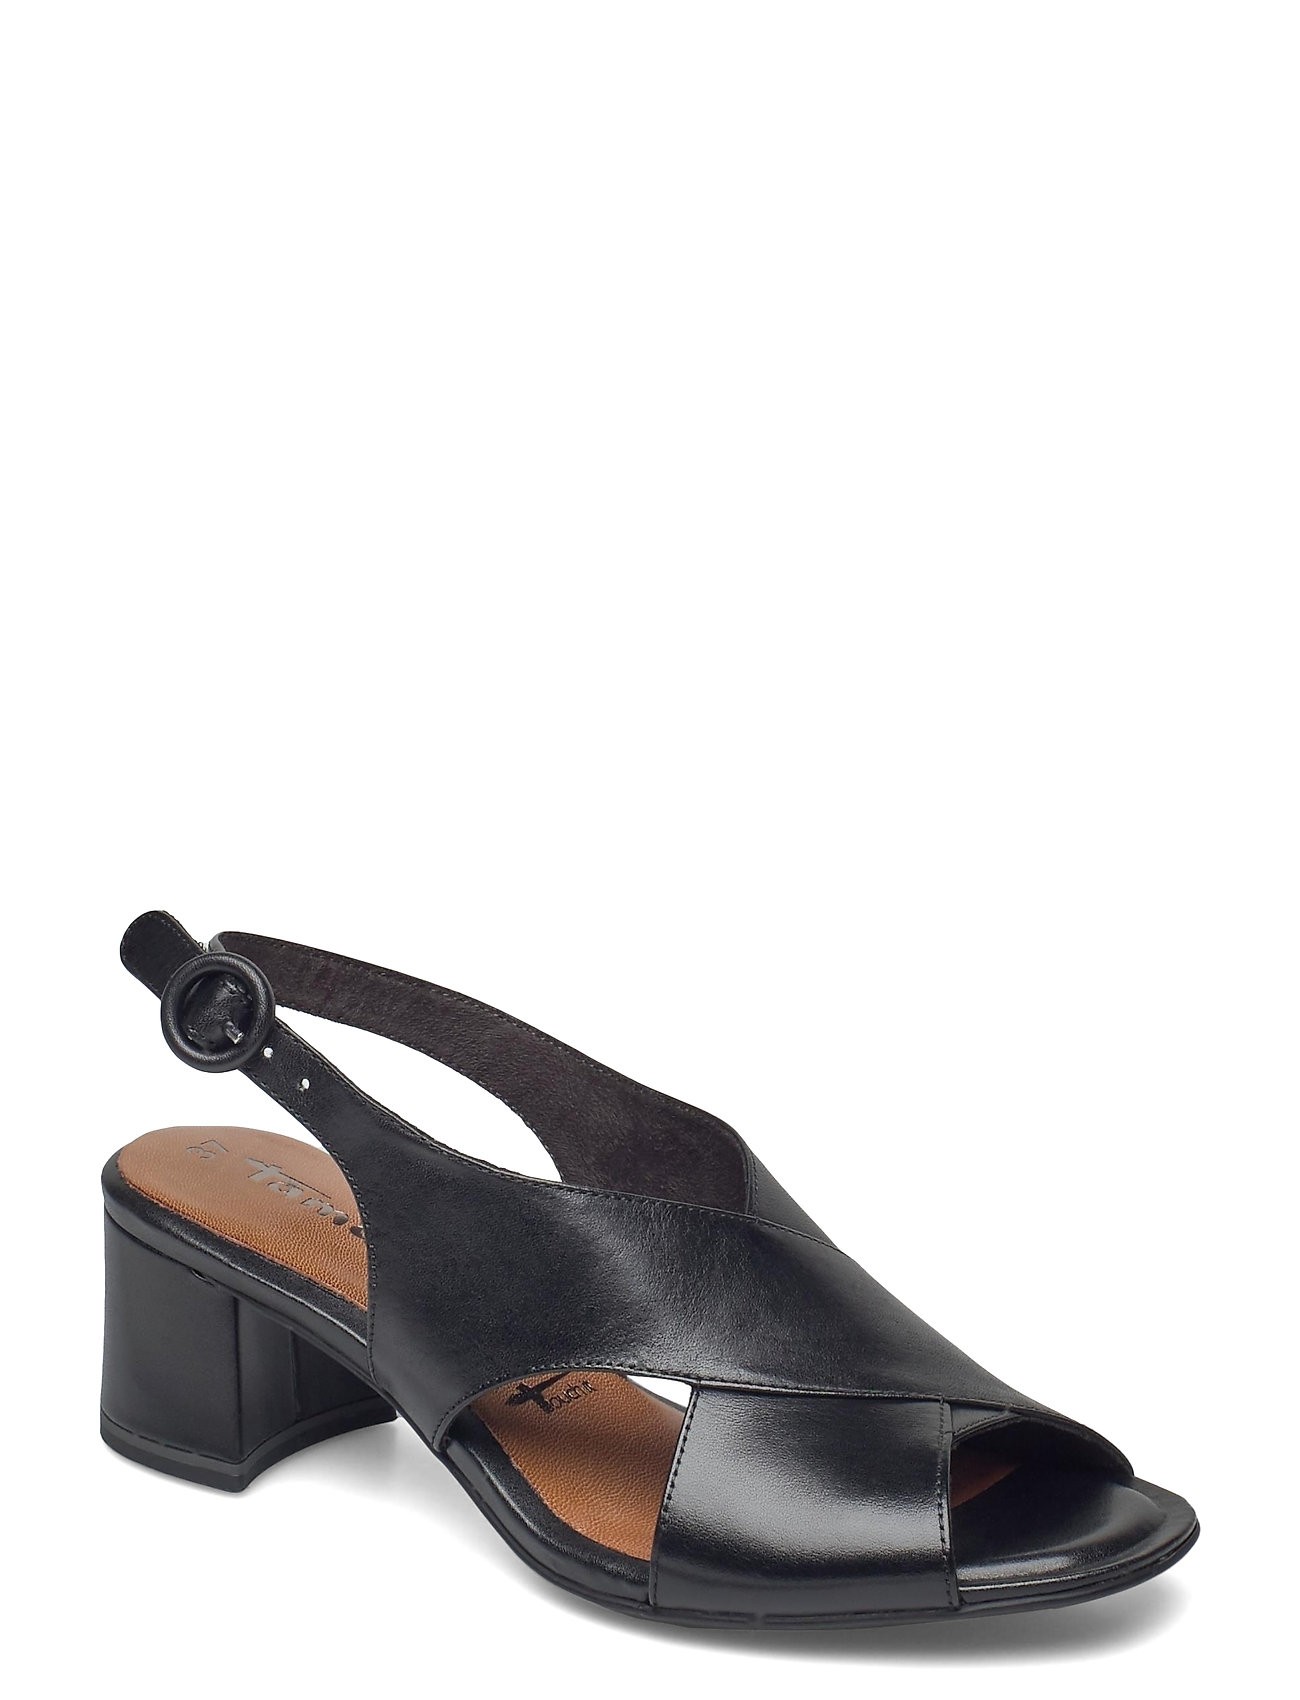 Woms Sandals Shoes Heels Pumps Sling Backs Sort Tamaris